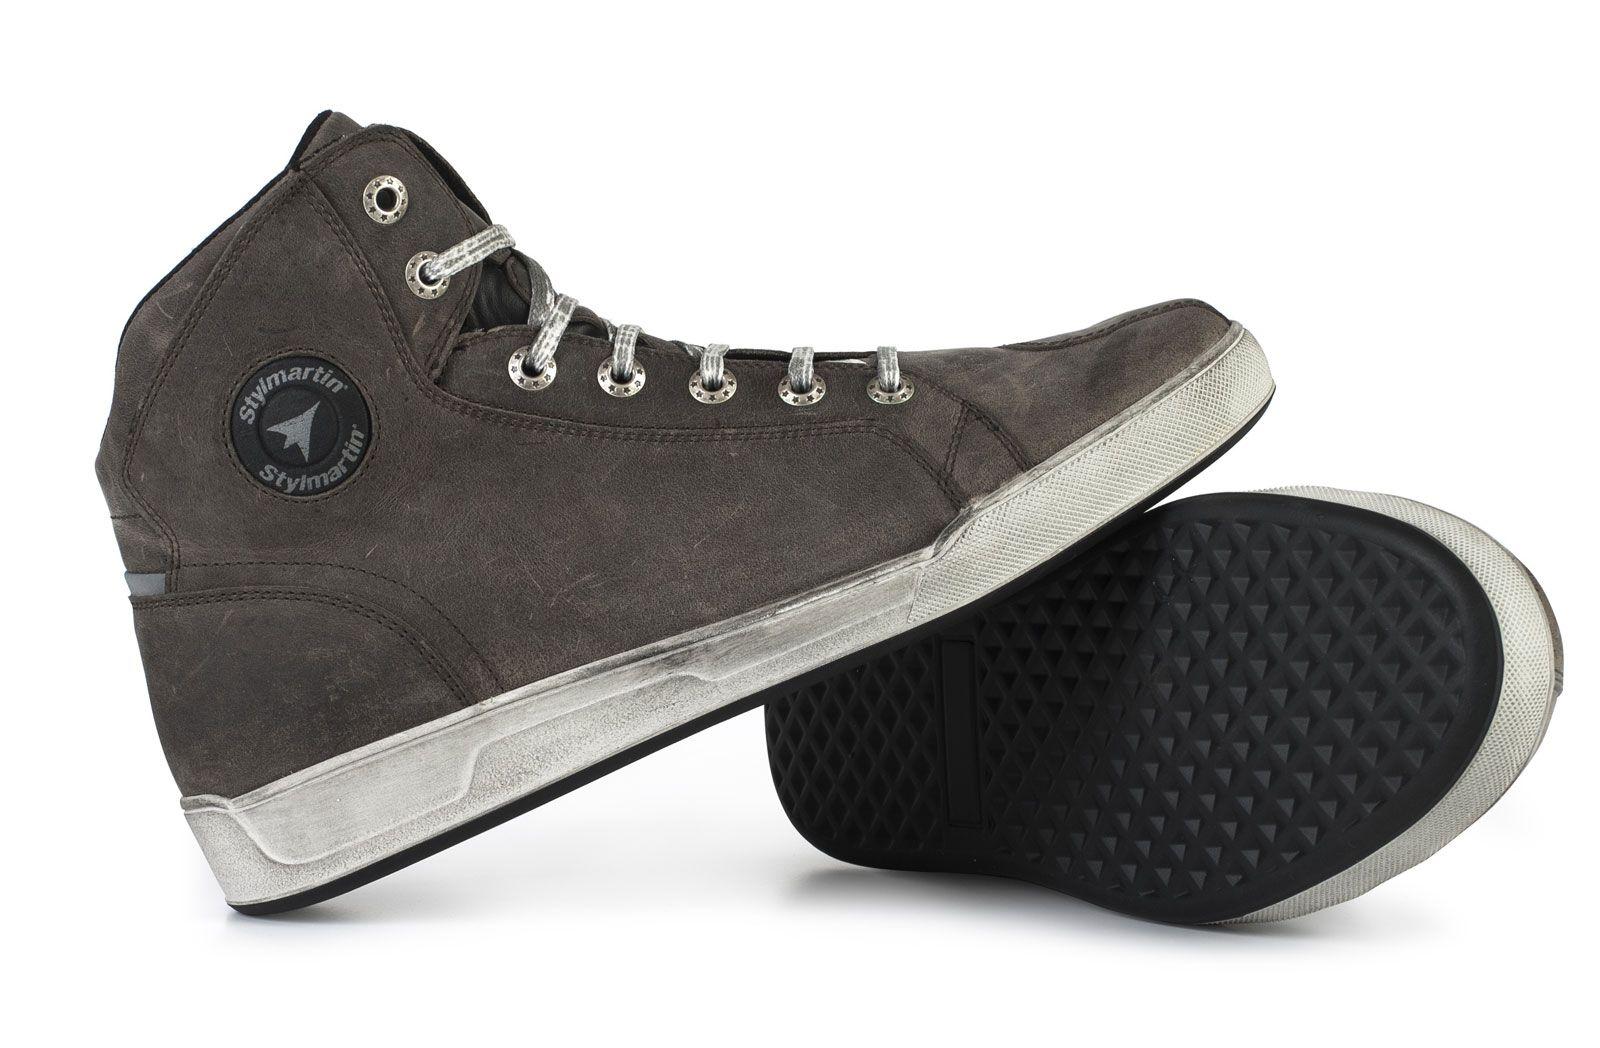 Stylmartin Marshall Schuhe